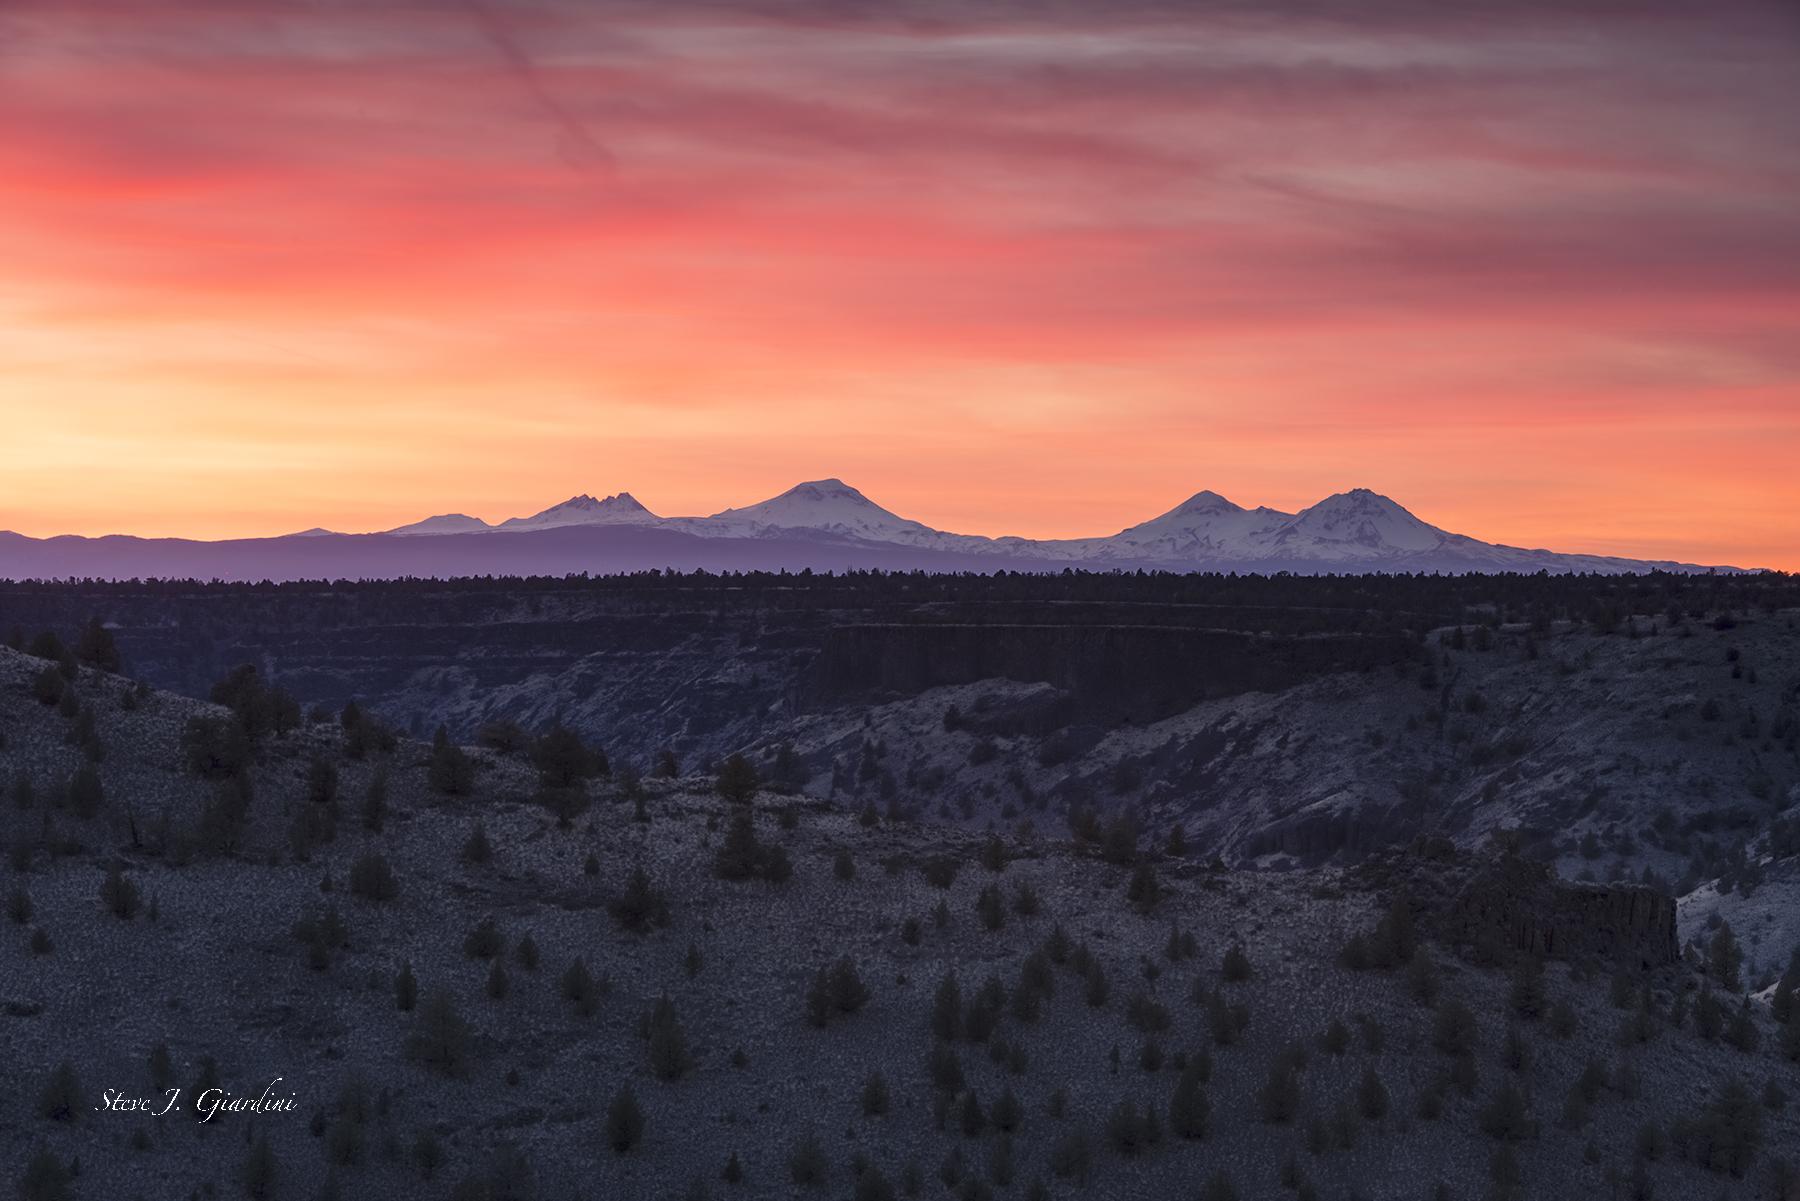 Chimney Rock Plateau Sunset 1810104LNND8